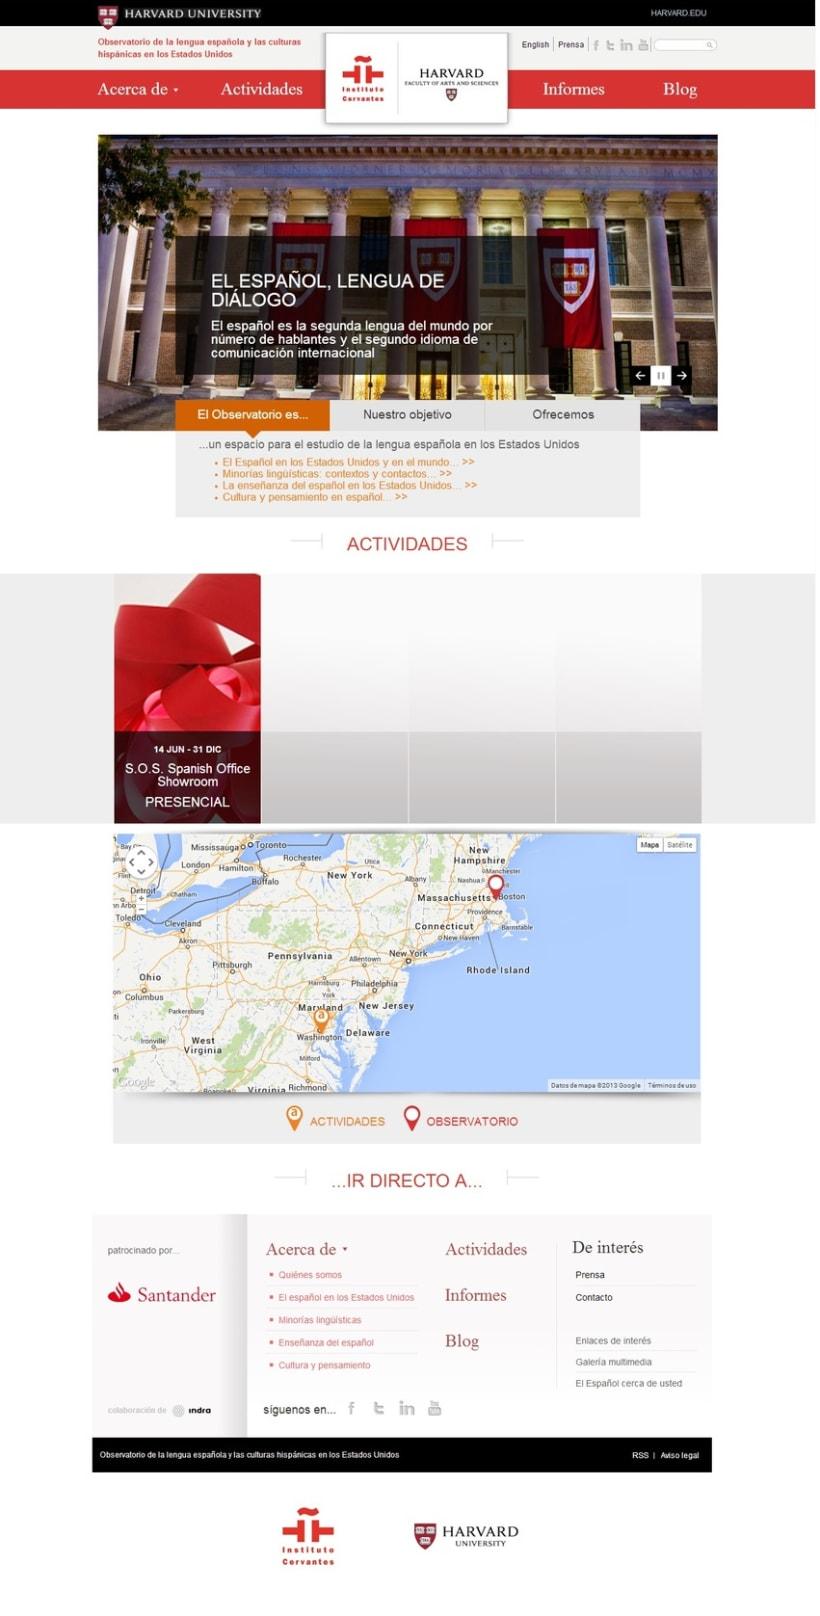 Observatorio de la Lengua española en la Universidad de Harvard -1